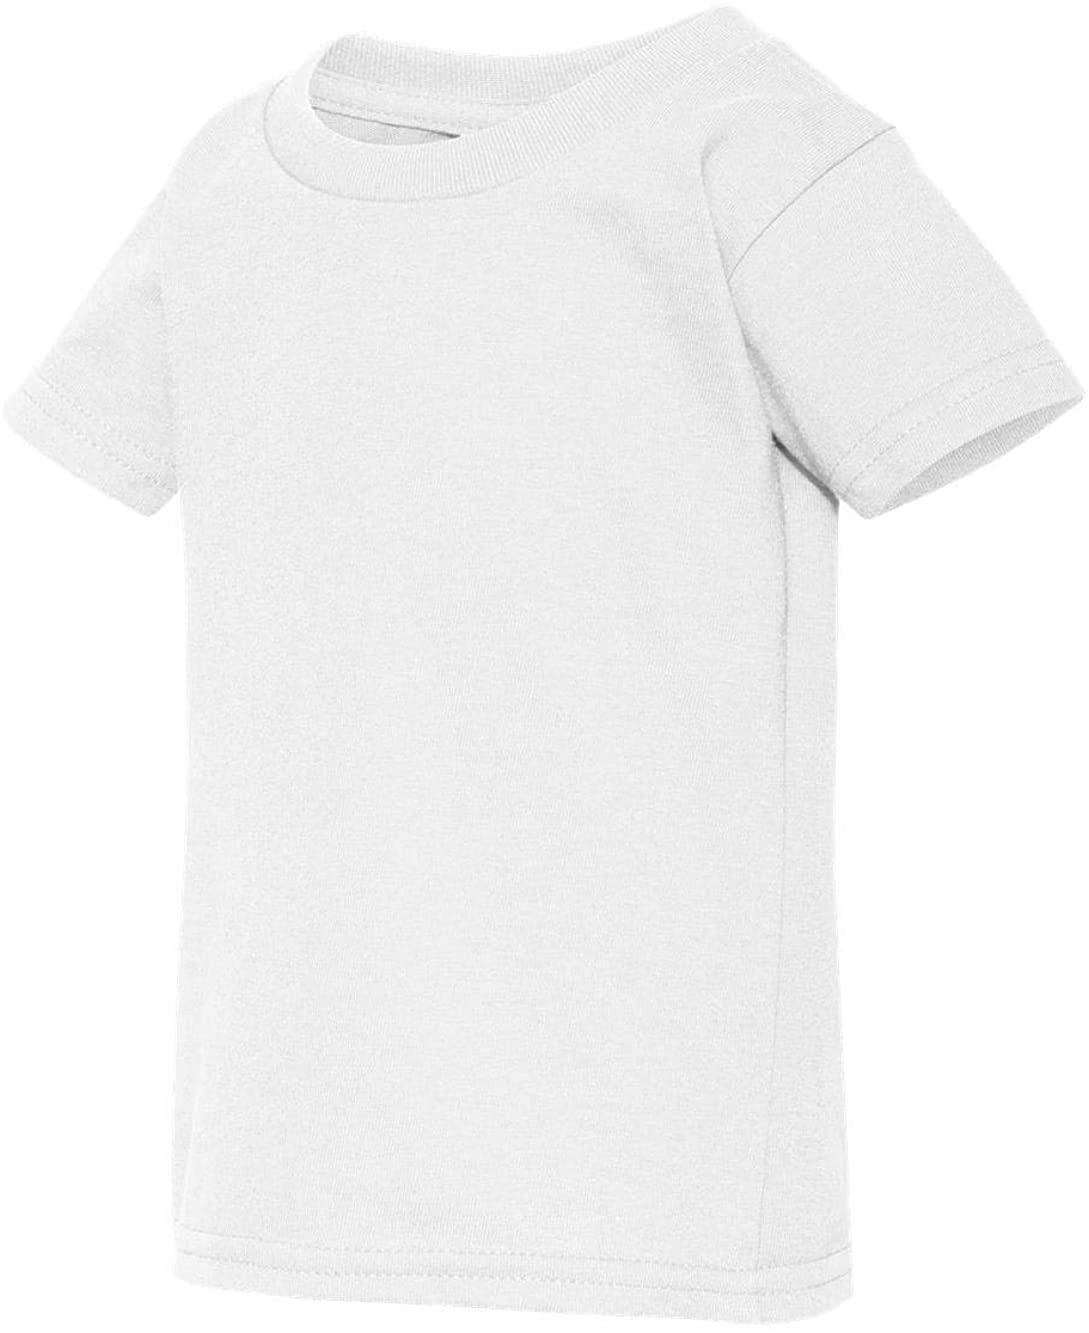 Gildan Todler Boy's Heavy Cotton™ 5.3 oz. T-Shirt, White, 4T